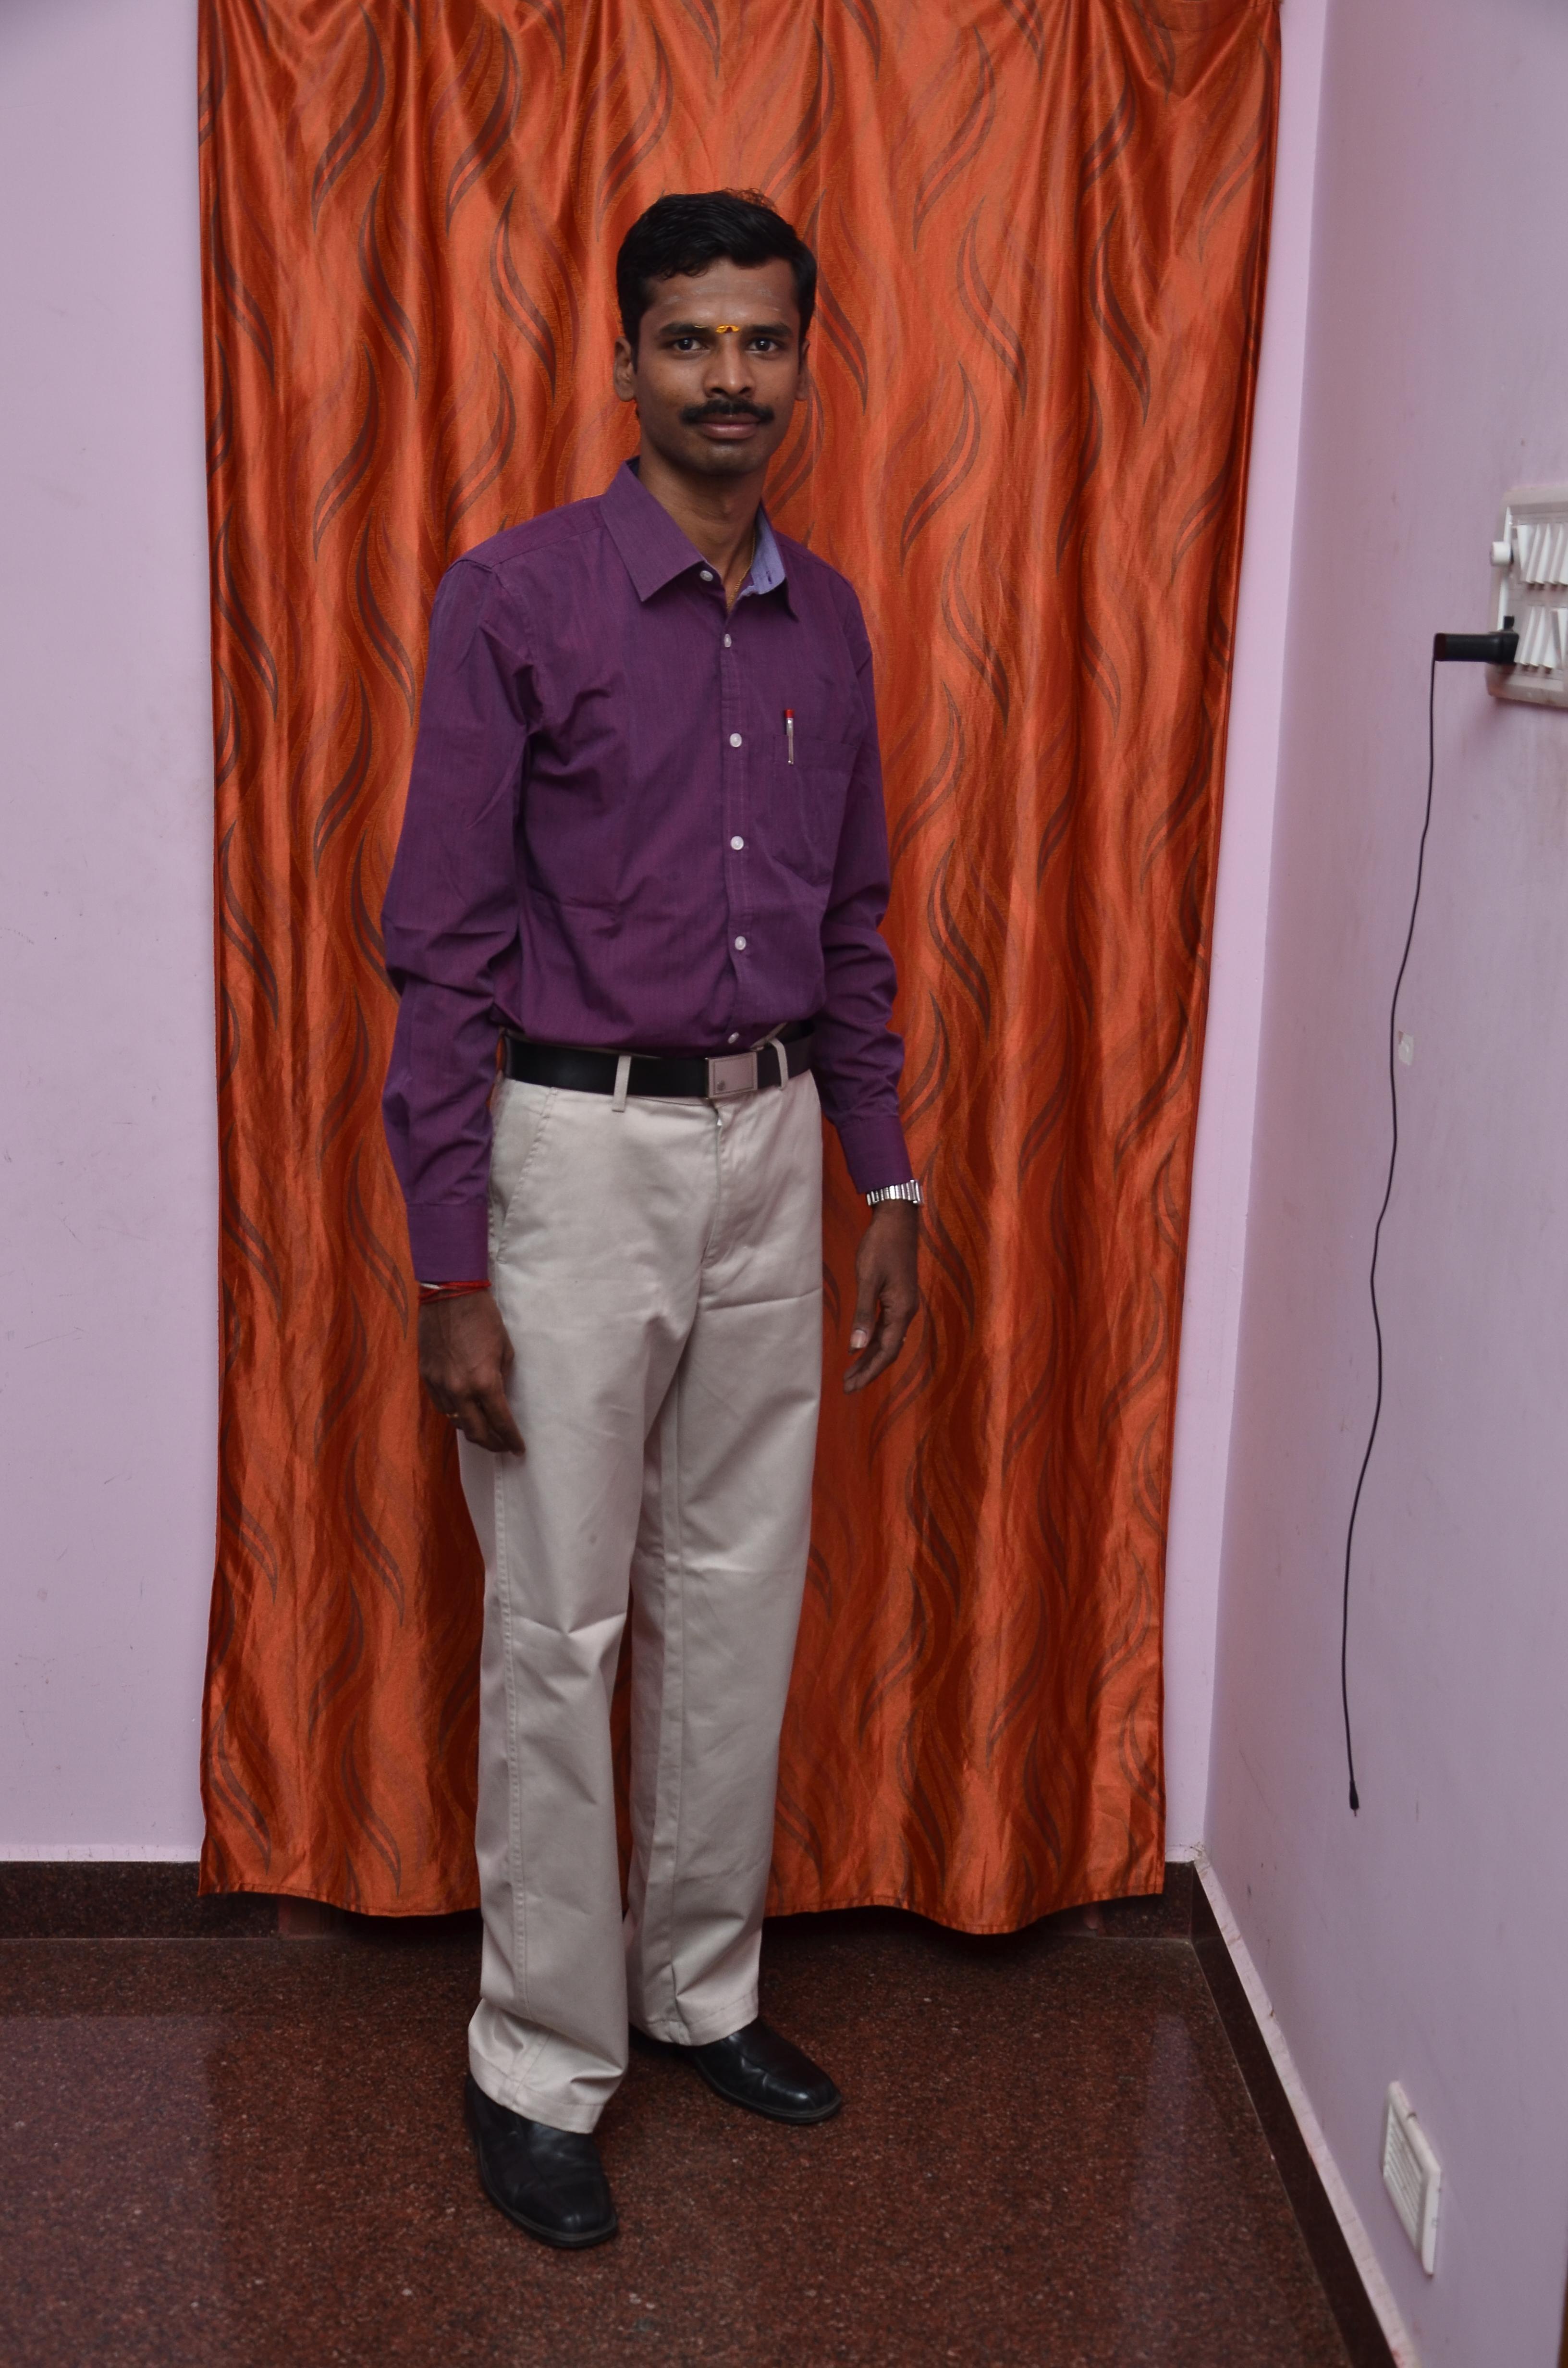 karkathar matrimony trichy karkathar sangam matrimony deepak kumar sex male age 31 d o b 01 oct 1985 city chennai height 6 feet country father native place thiruvalangadu